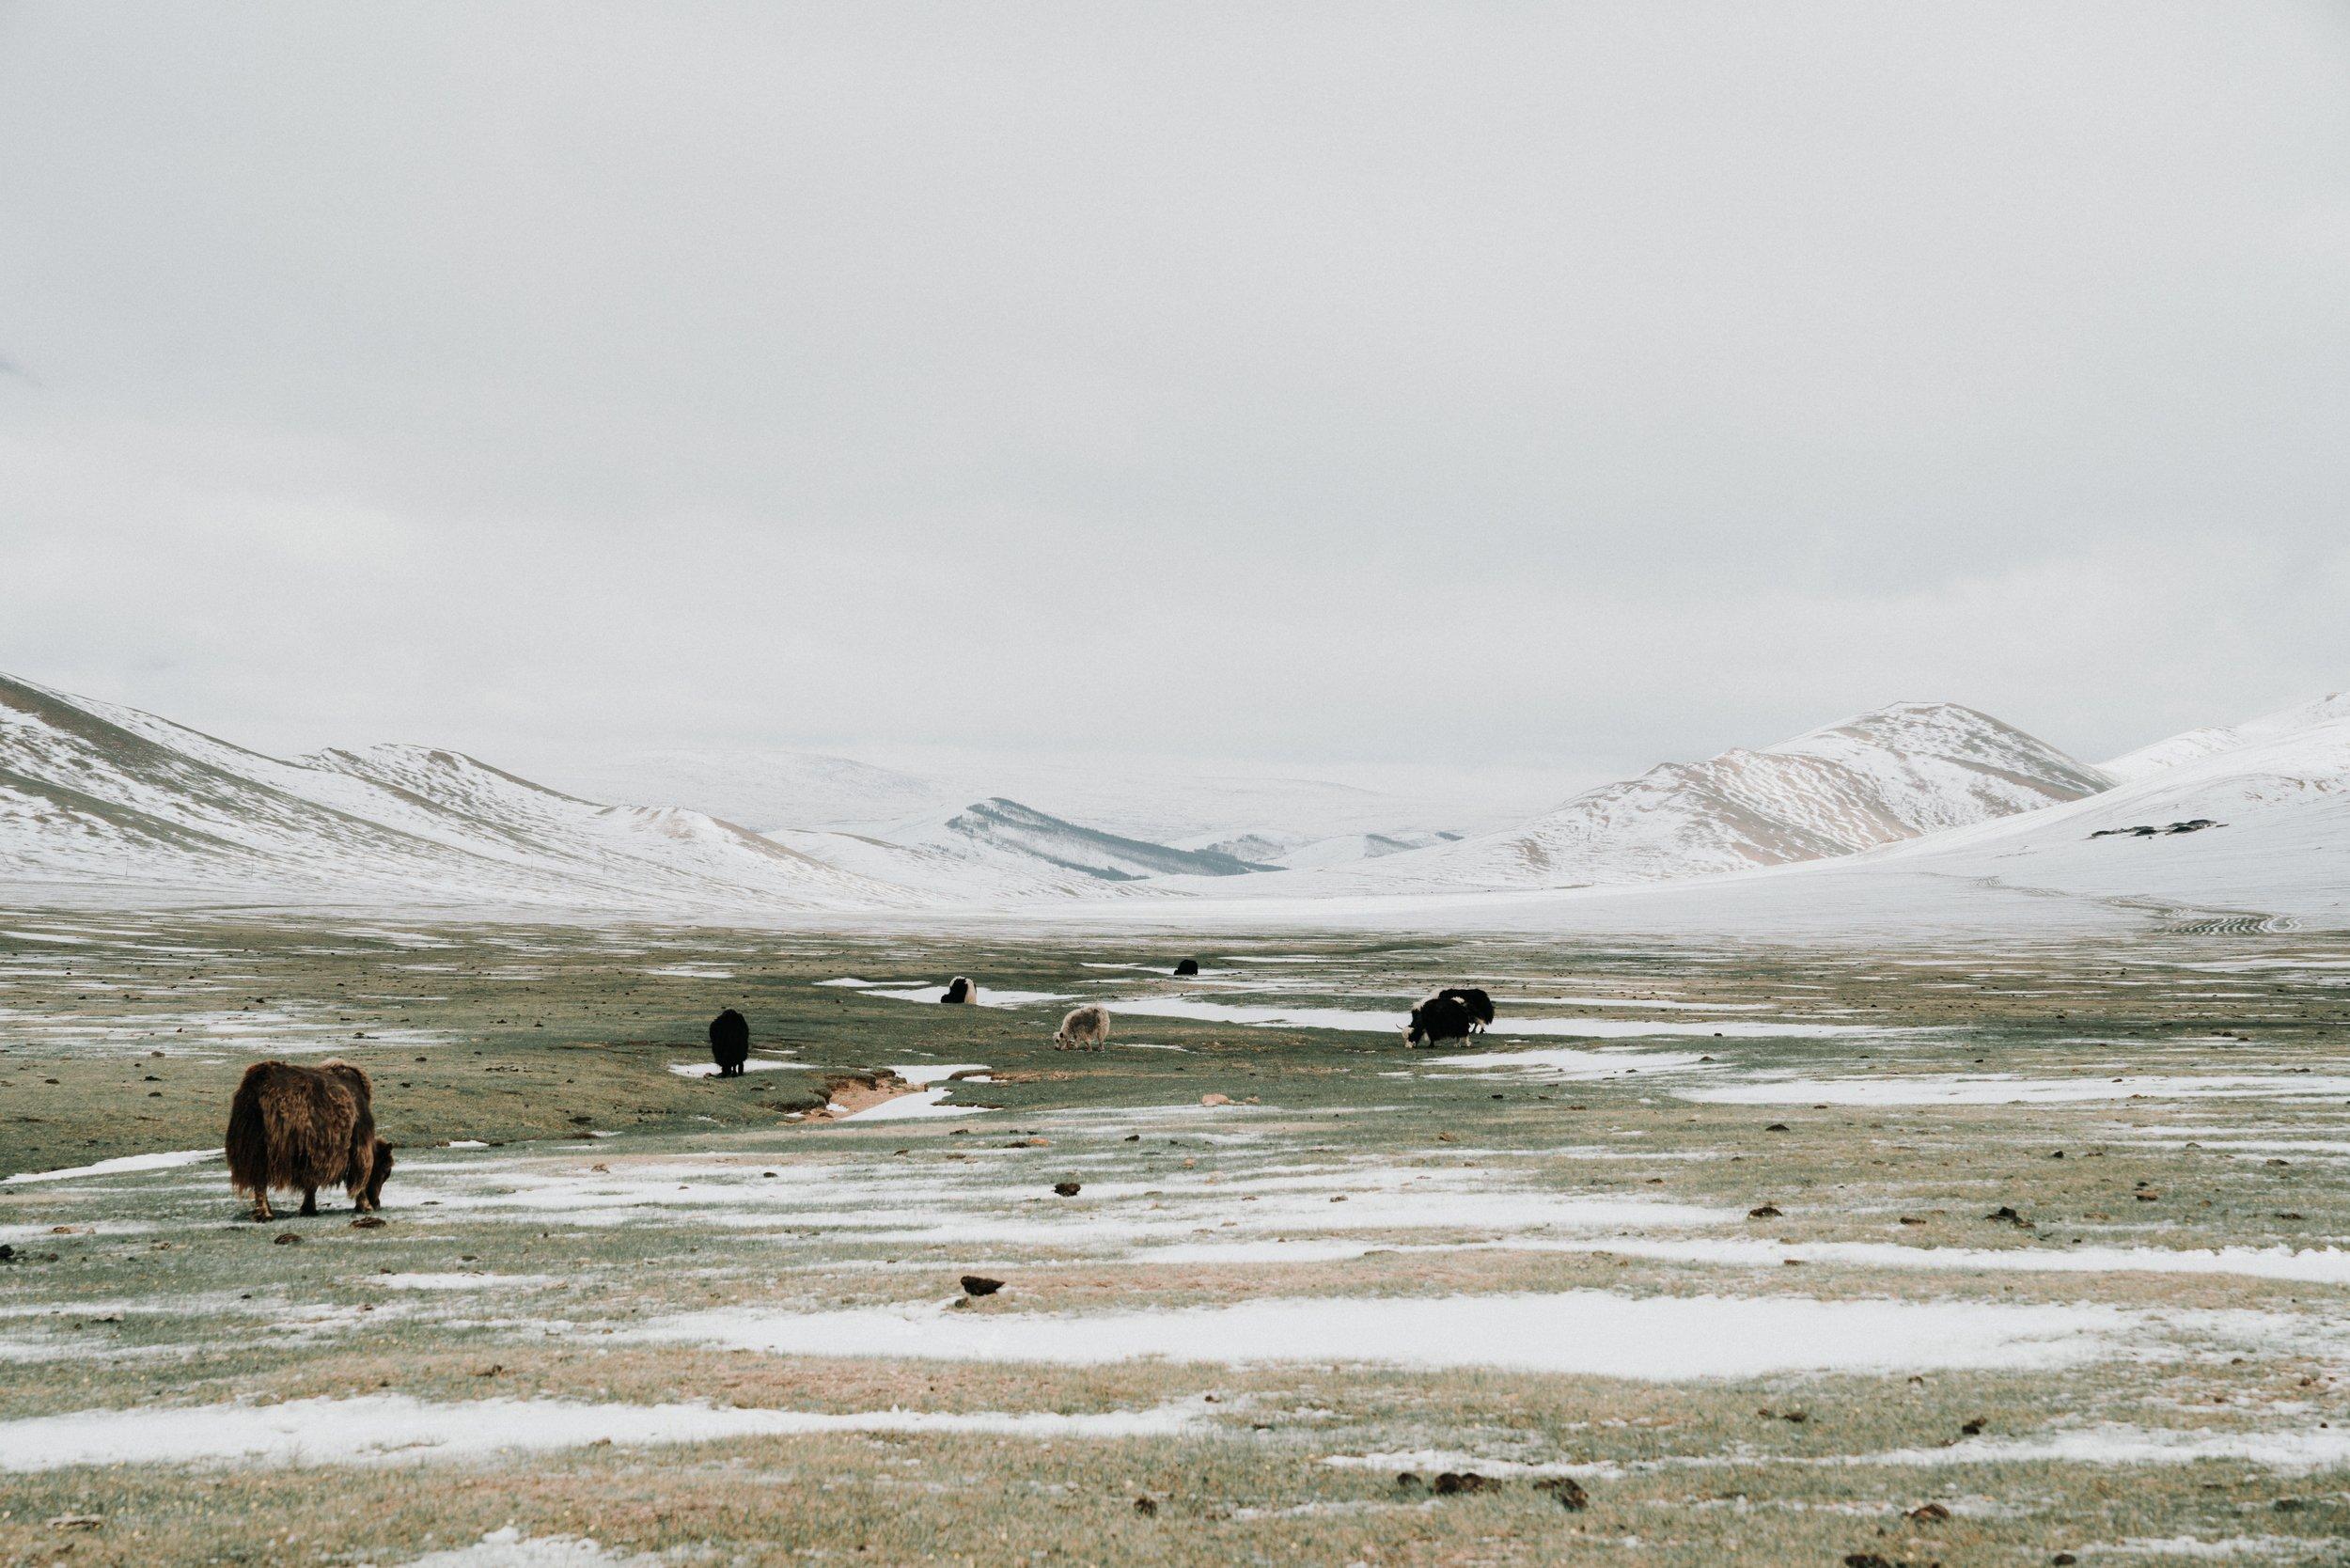 Mongolia_2018 (333 of 403) copy.jpg